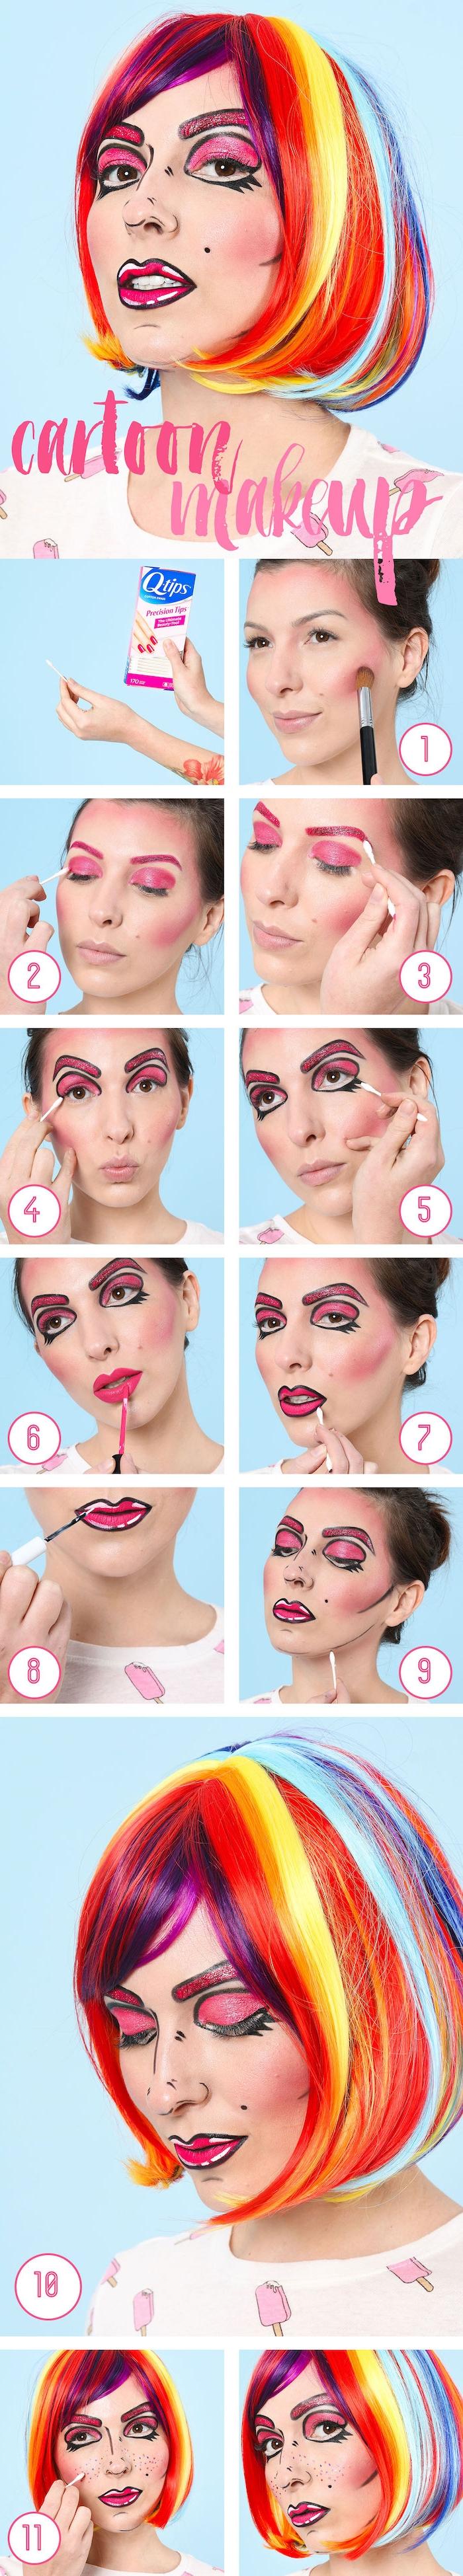 Cartoon Make-up zum Nachmachen, Anleitung in elf Schritten, Halloween Schminken Ideen